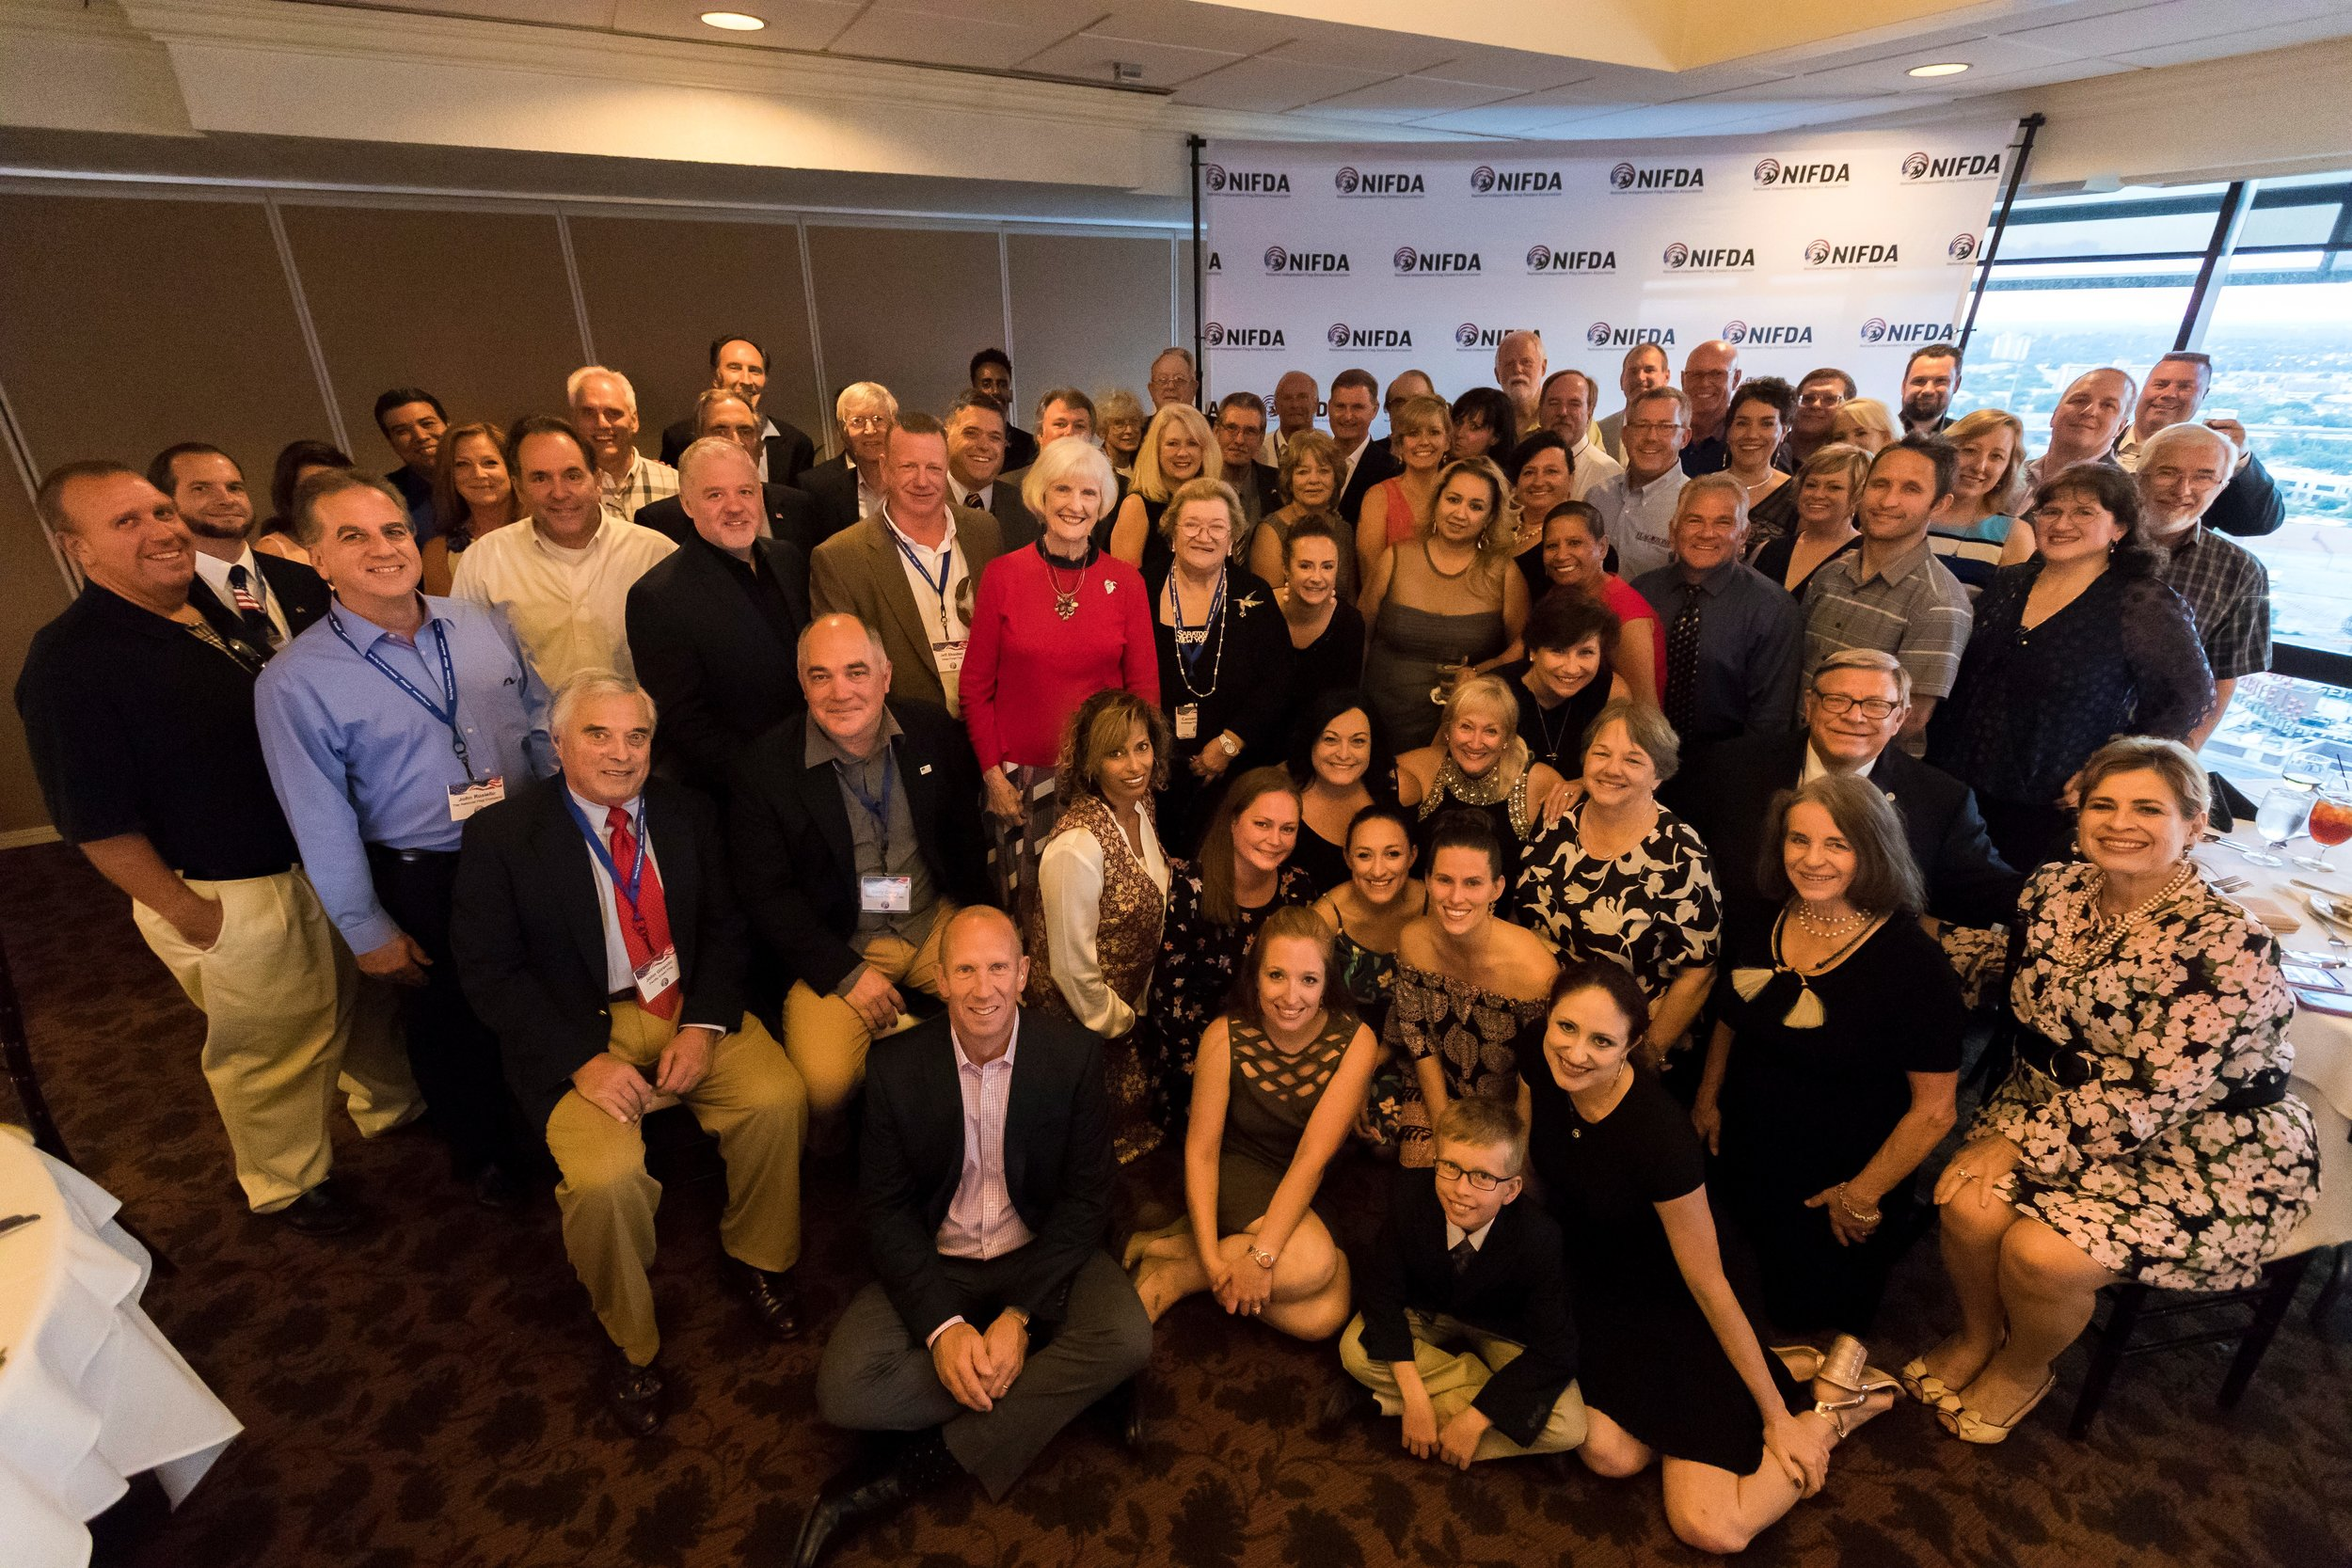 2018 Banquet Group Photo.jpg